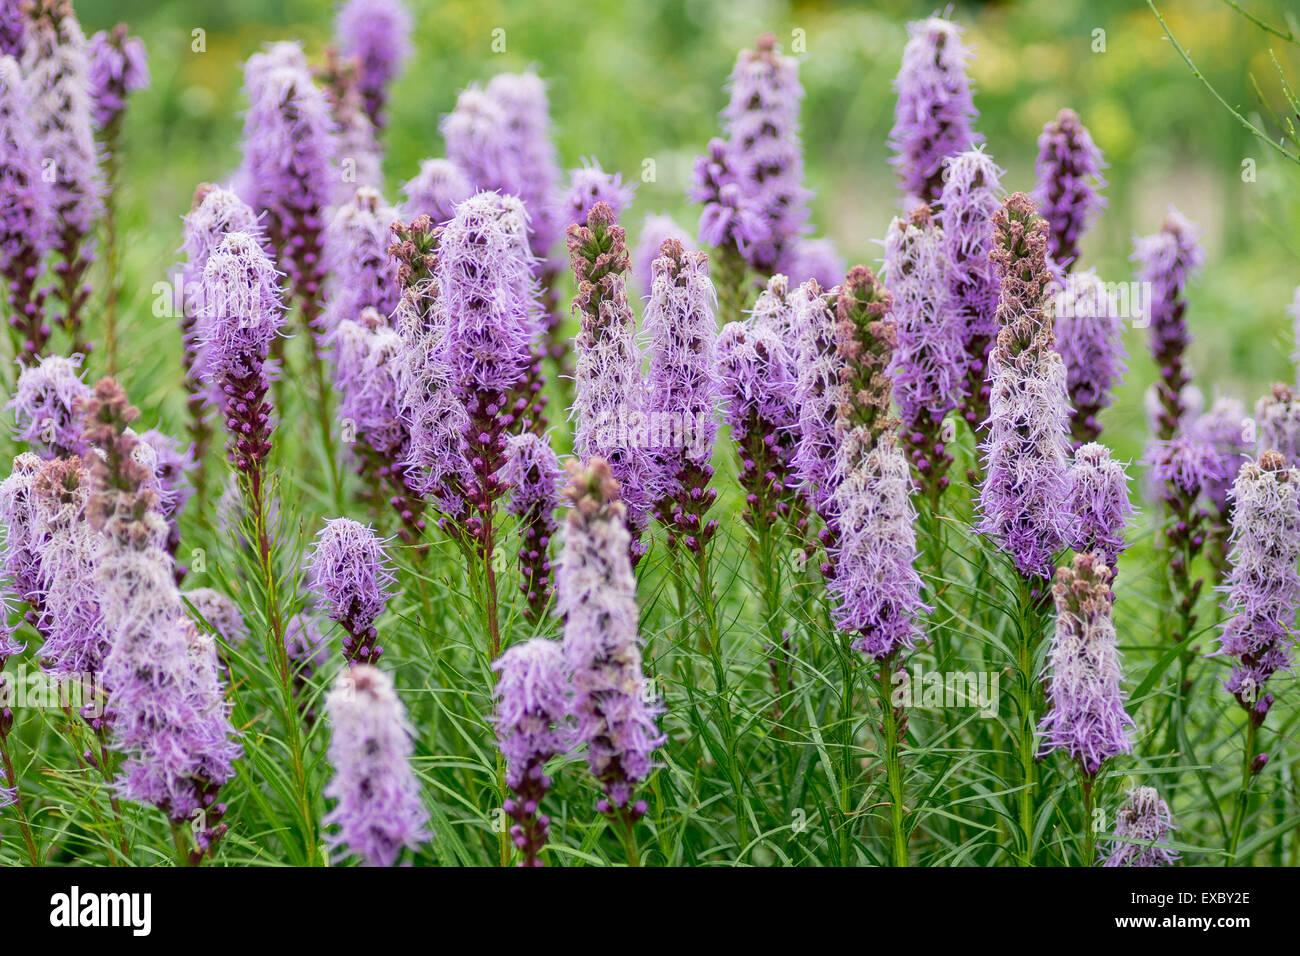 Blazing star purple flowers Liatris spicata - Stock Image